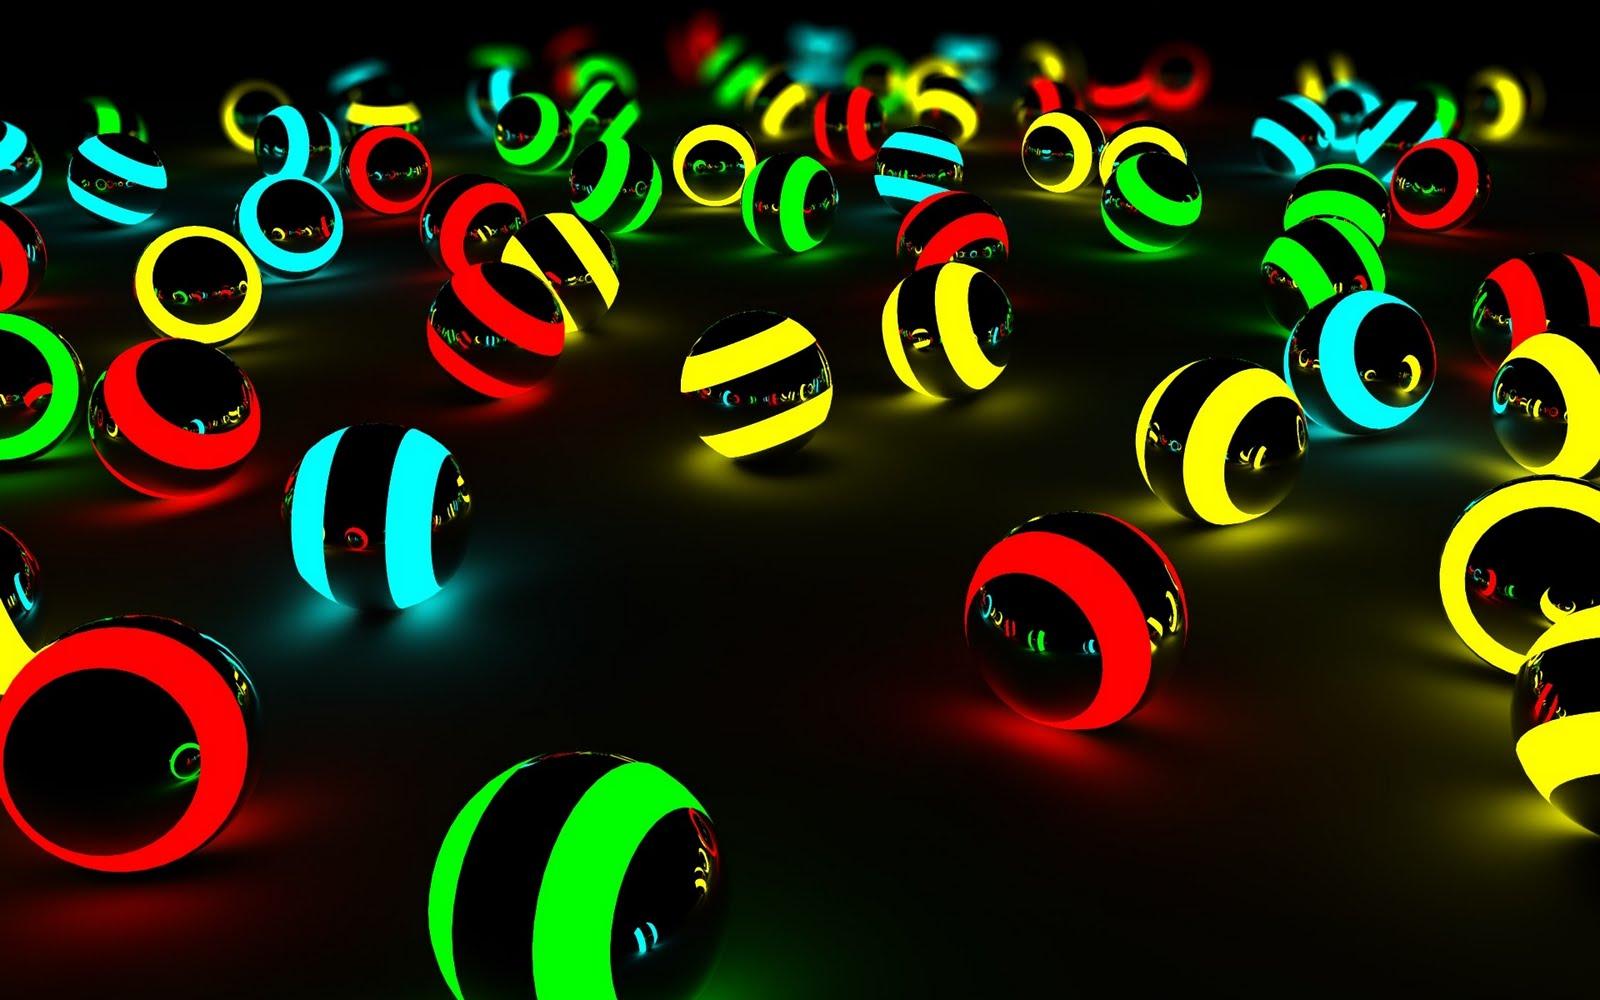 Free Download 3d Balls Glow Colors Dark Hd Wallpapers Epic